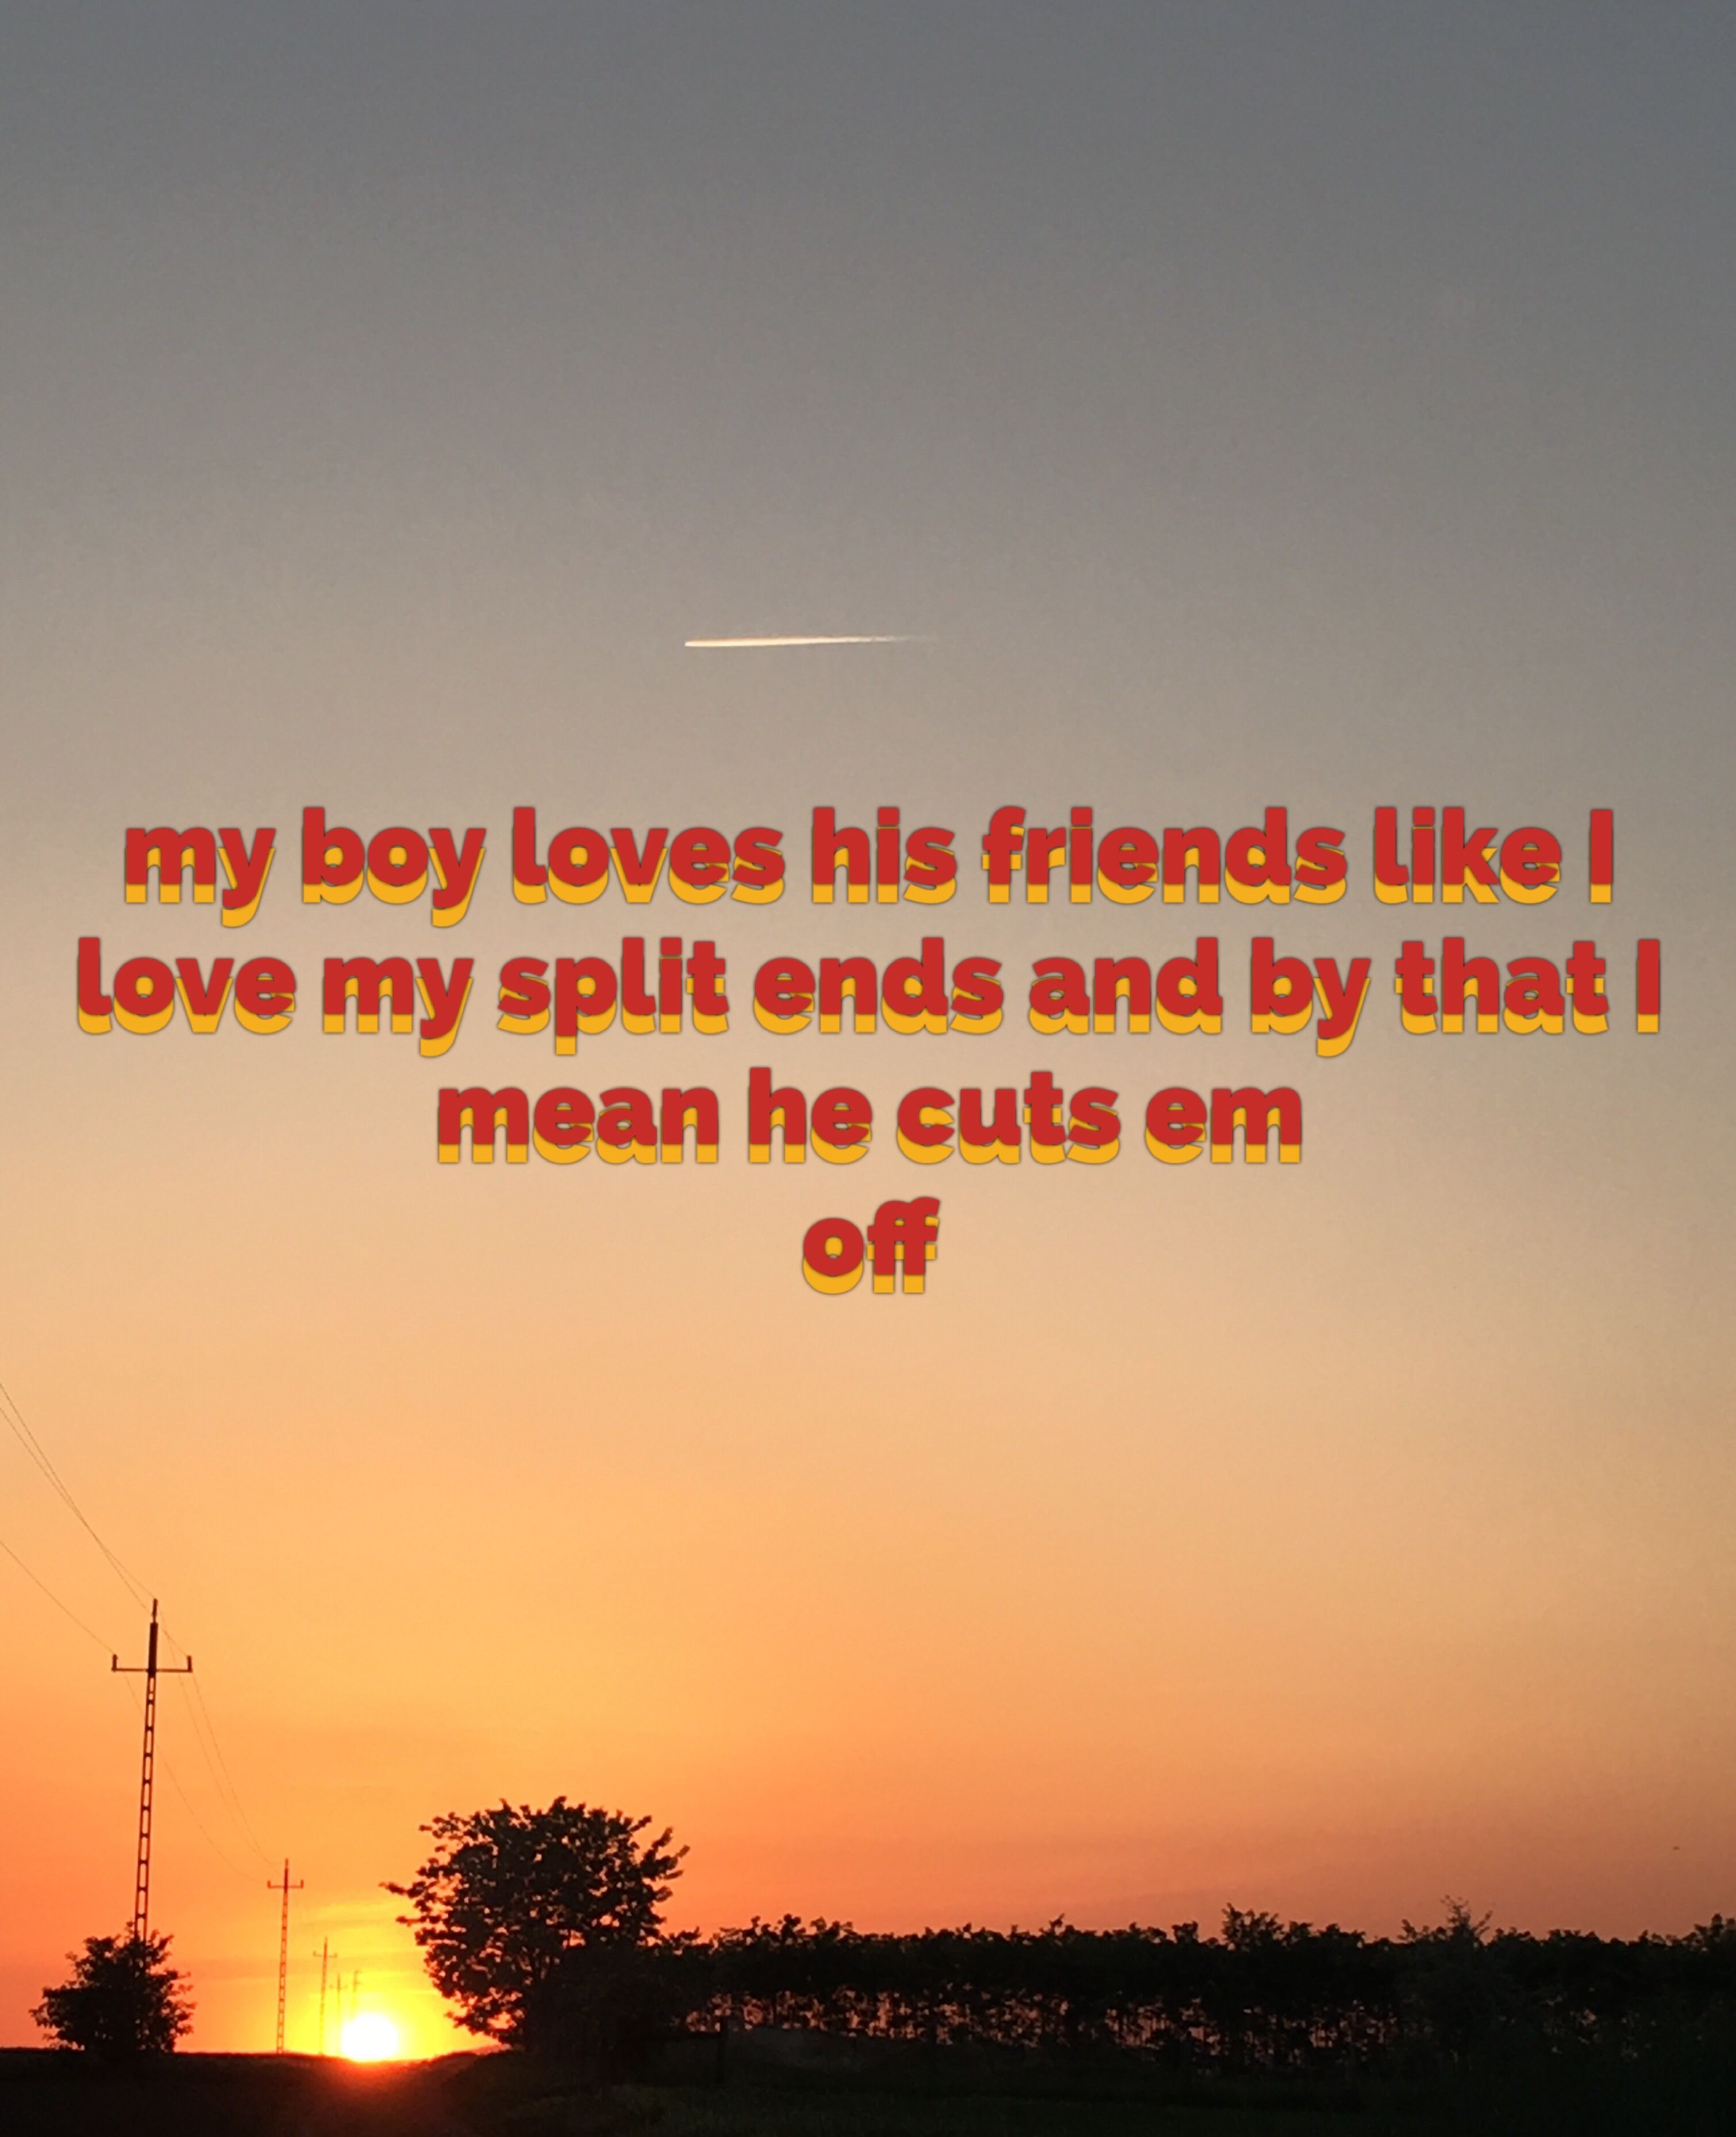 Billie Eilishmy boy lyrics Song lyrics wallpaper